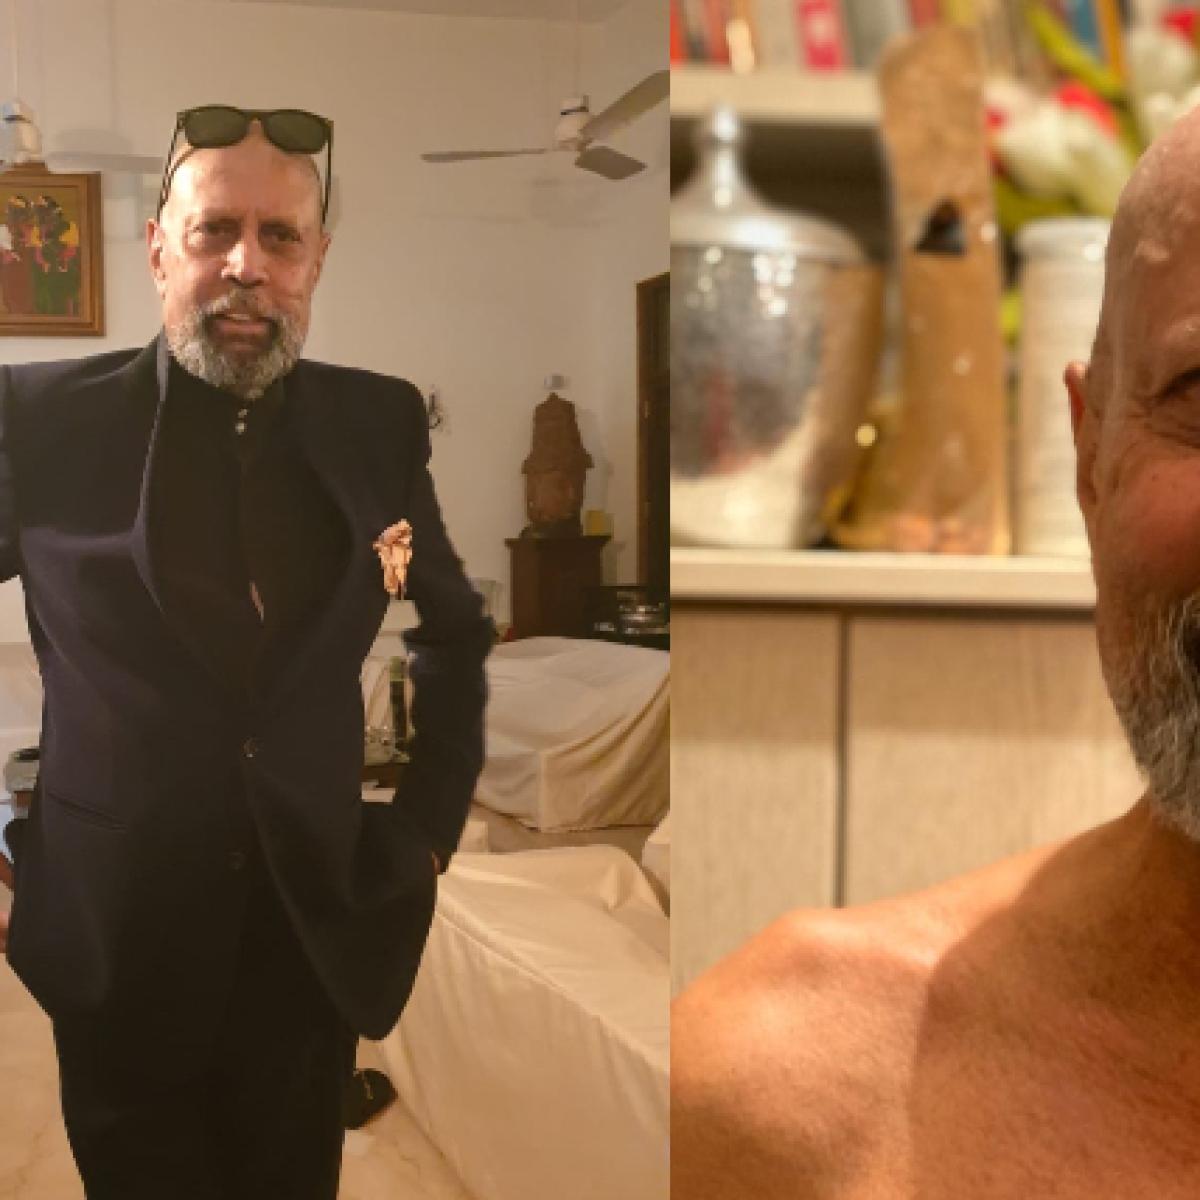 Kapil Dev's new bald chic finds a fan in Anupam Kher